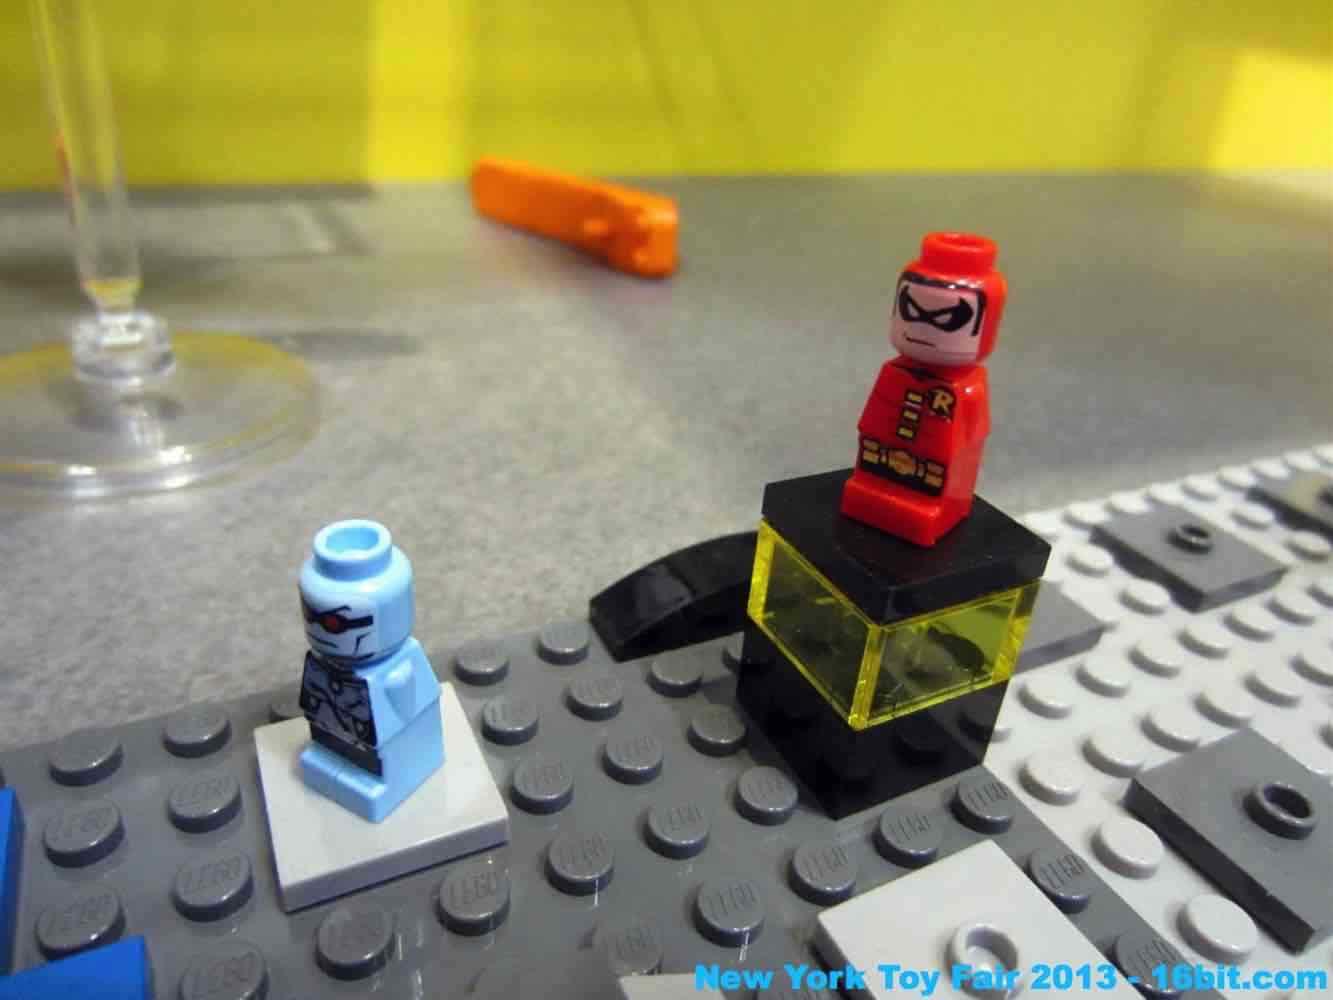 16bit Com Toy Fair Coverage Of Lego Games From Adam Pawlus